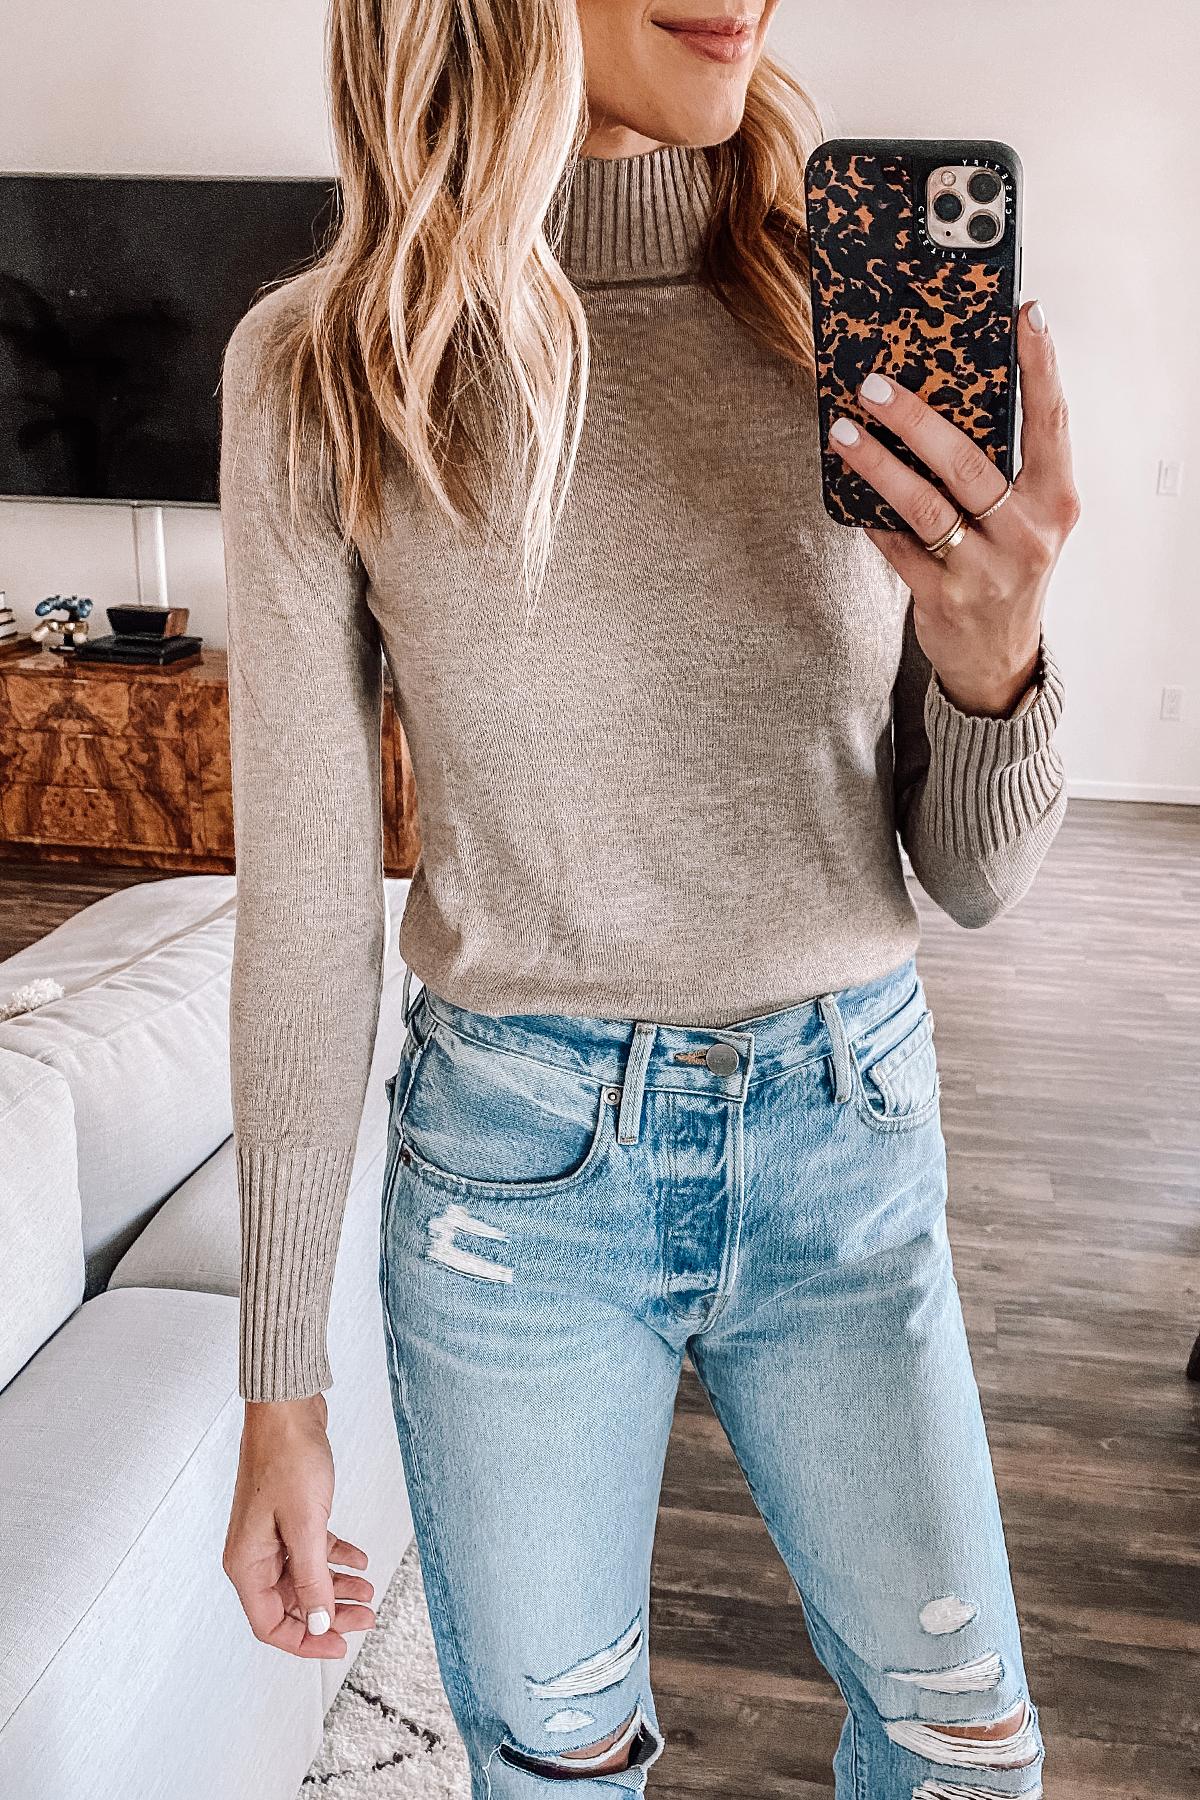 Fashion Jackson Wearing Taupe Mock Neck Amazon Sweater Ripped Jeans